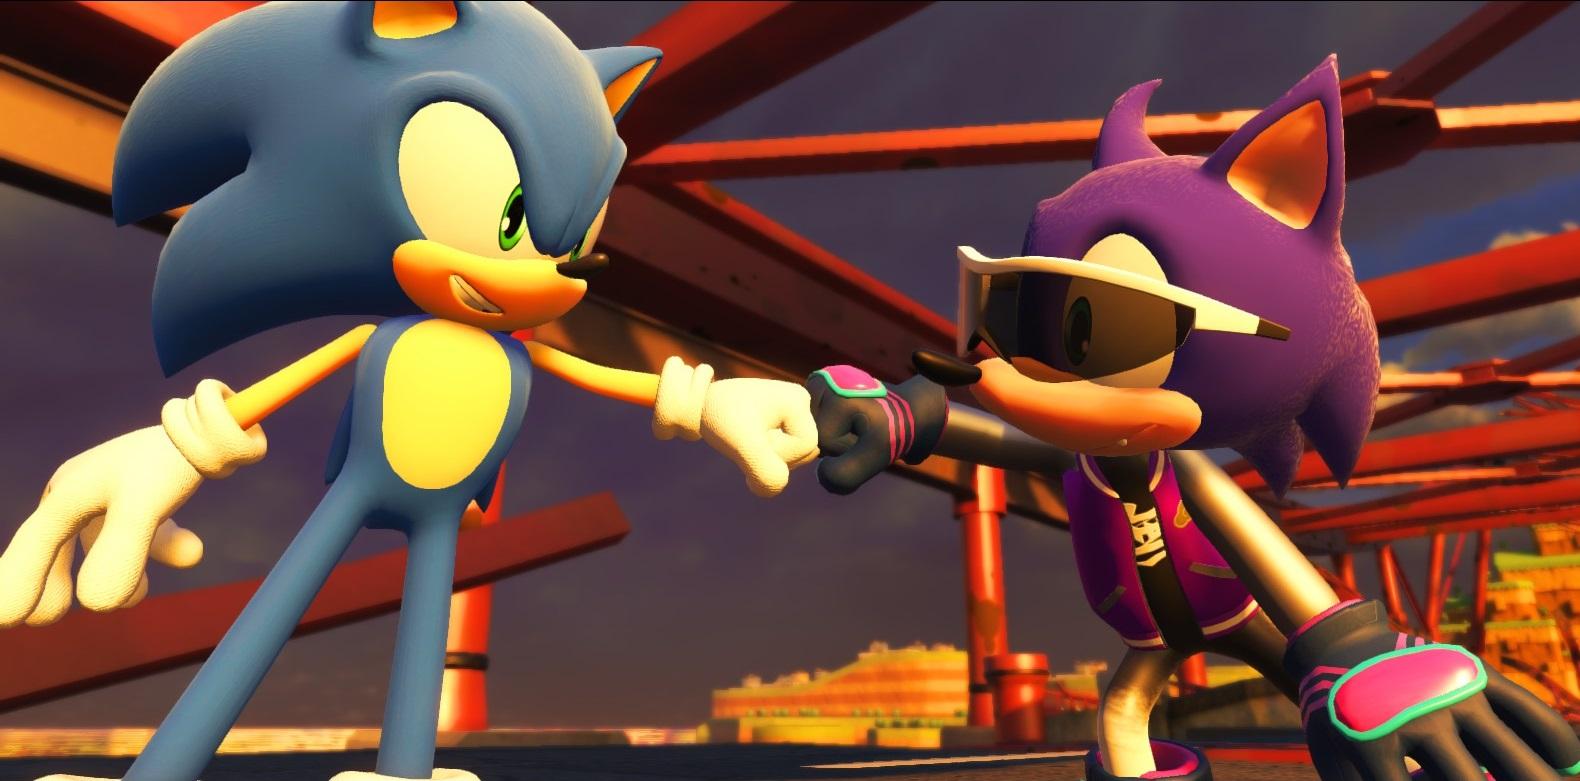 2006 Hedgehog Mods Sonic